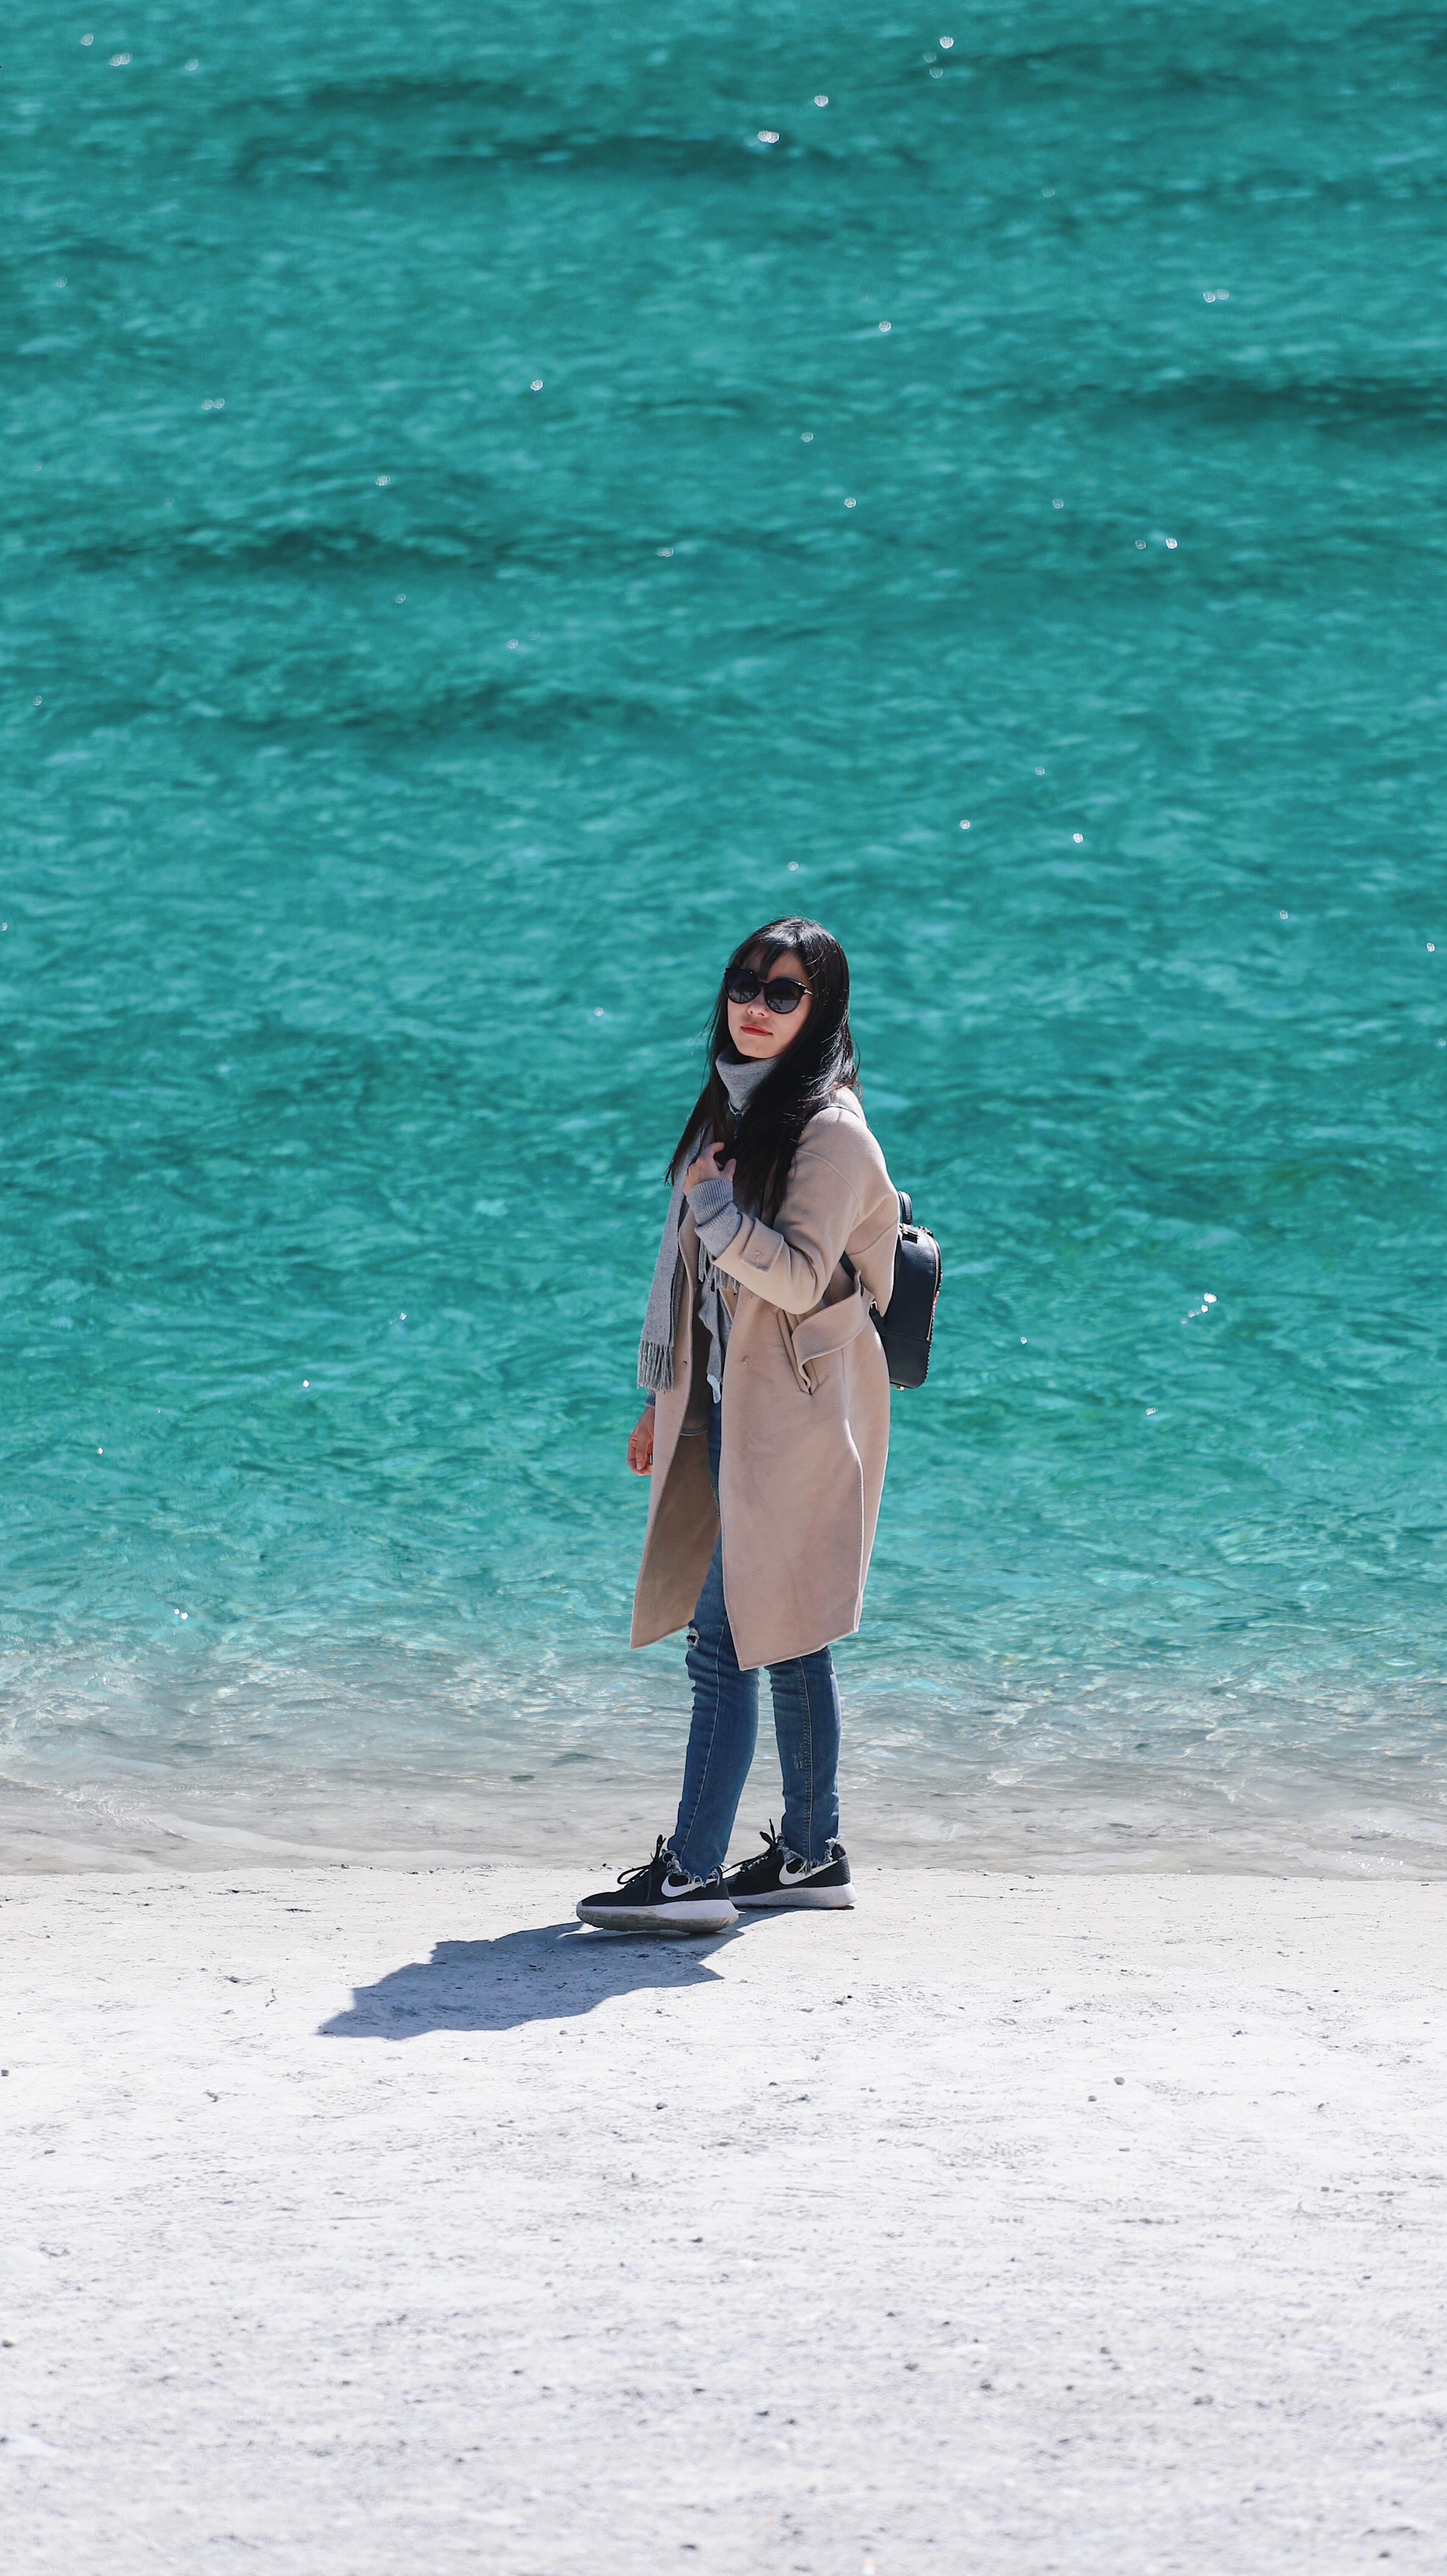 woman standing on beach shore